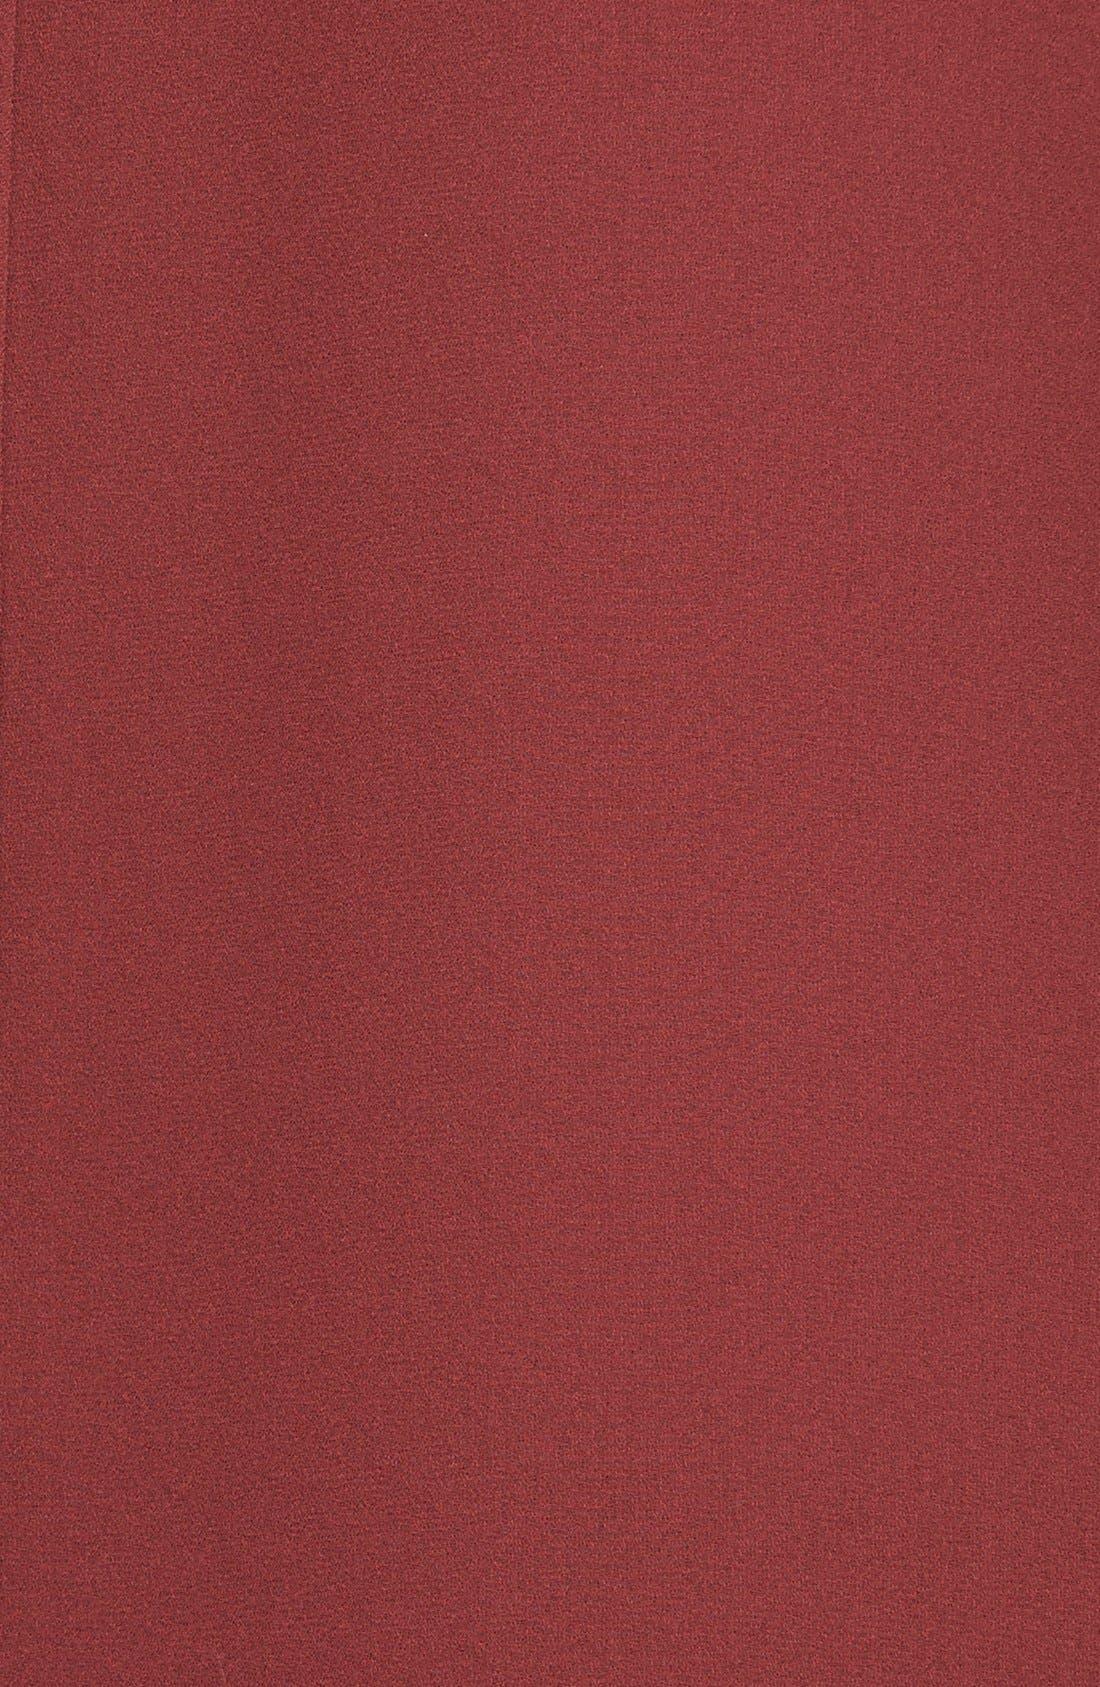 Cuff Sleeve Woven Tee,                             Alternate thumbnail 164, color,